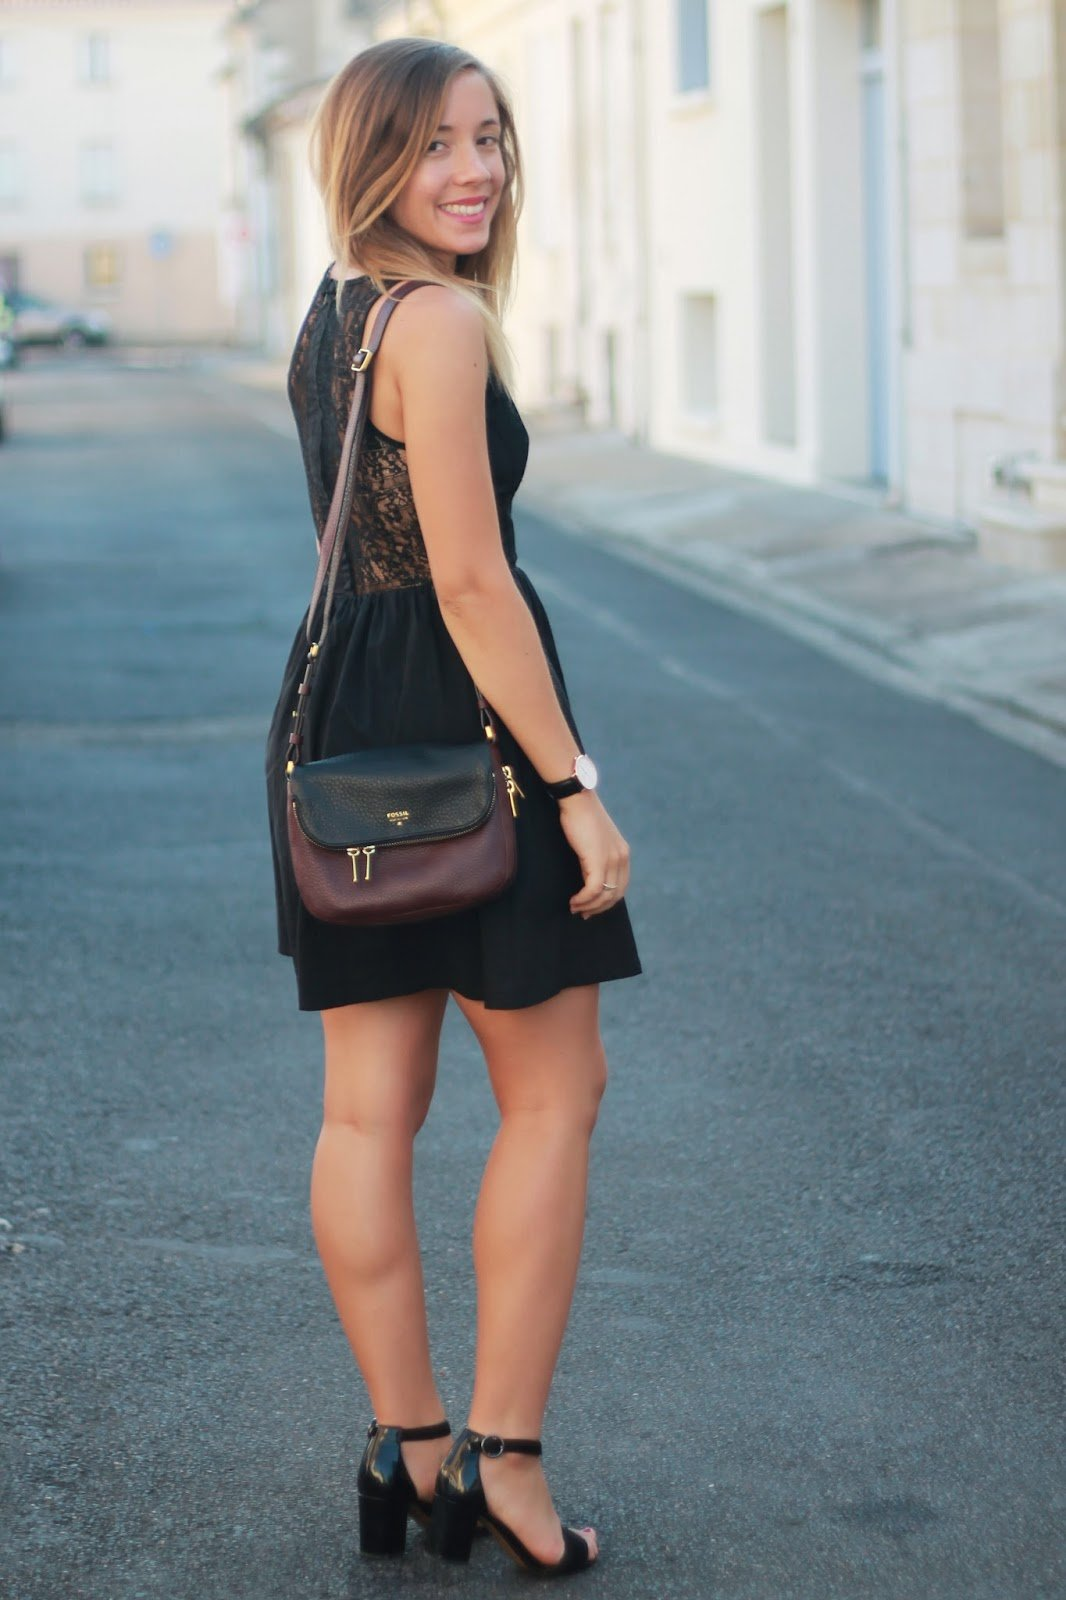 Porter une robe noire